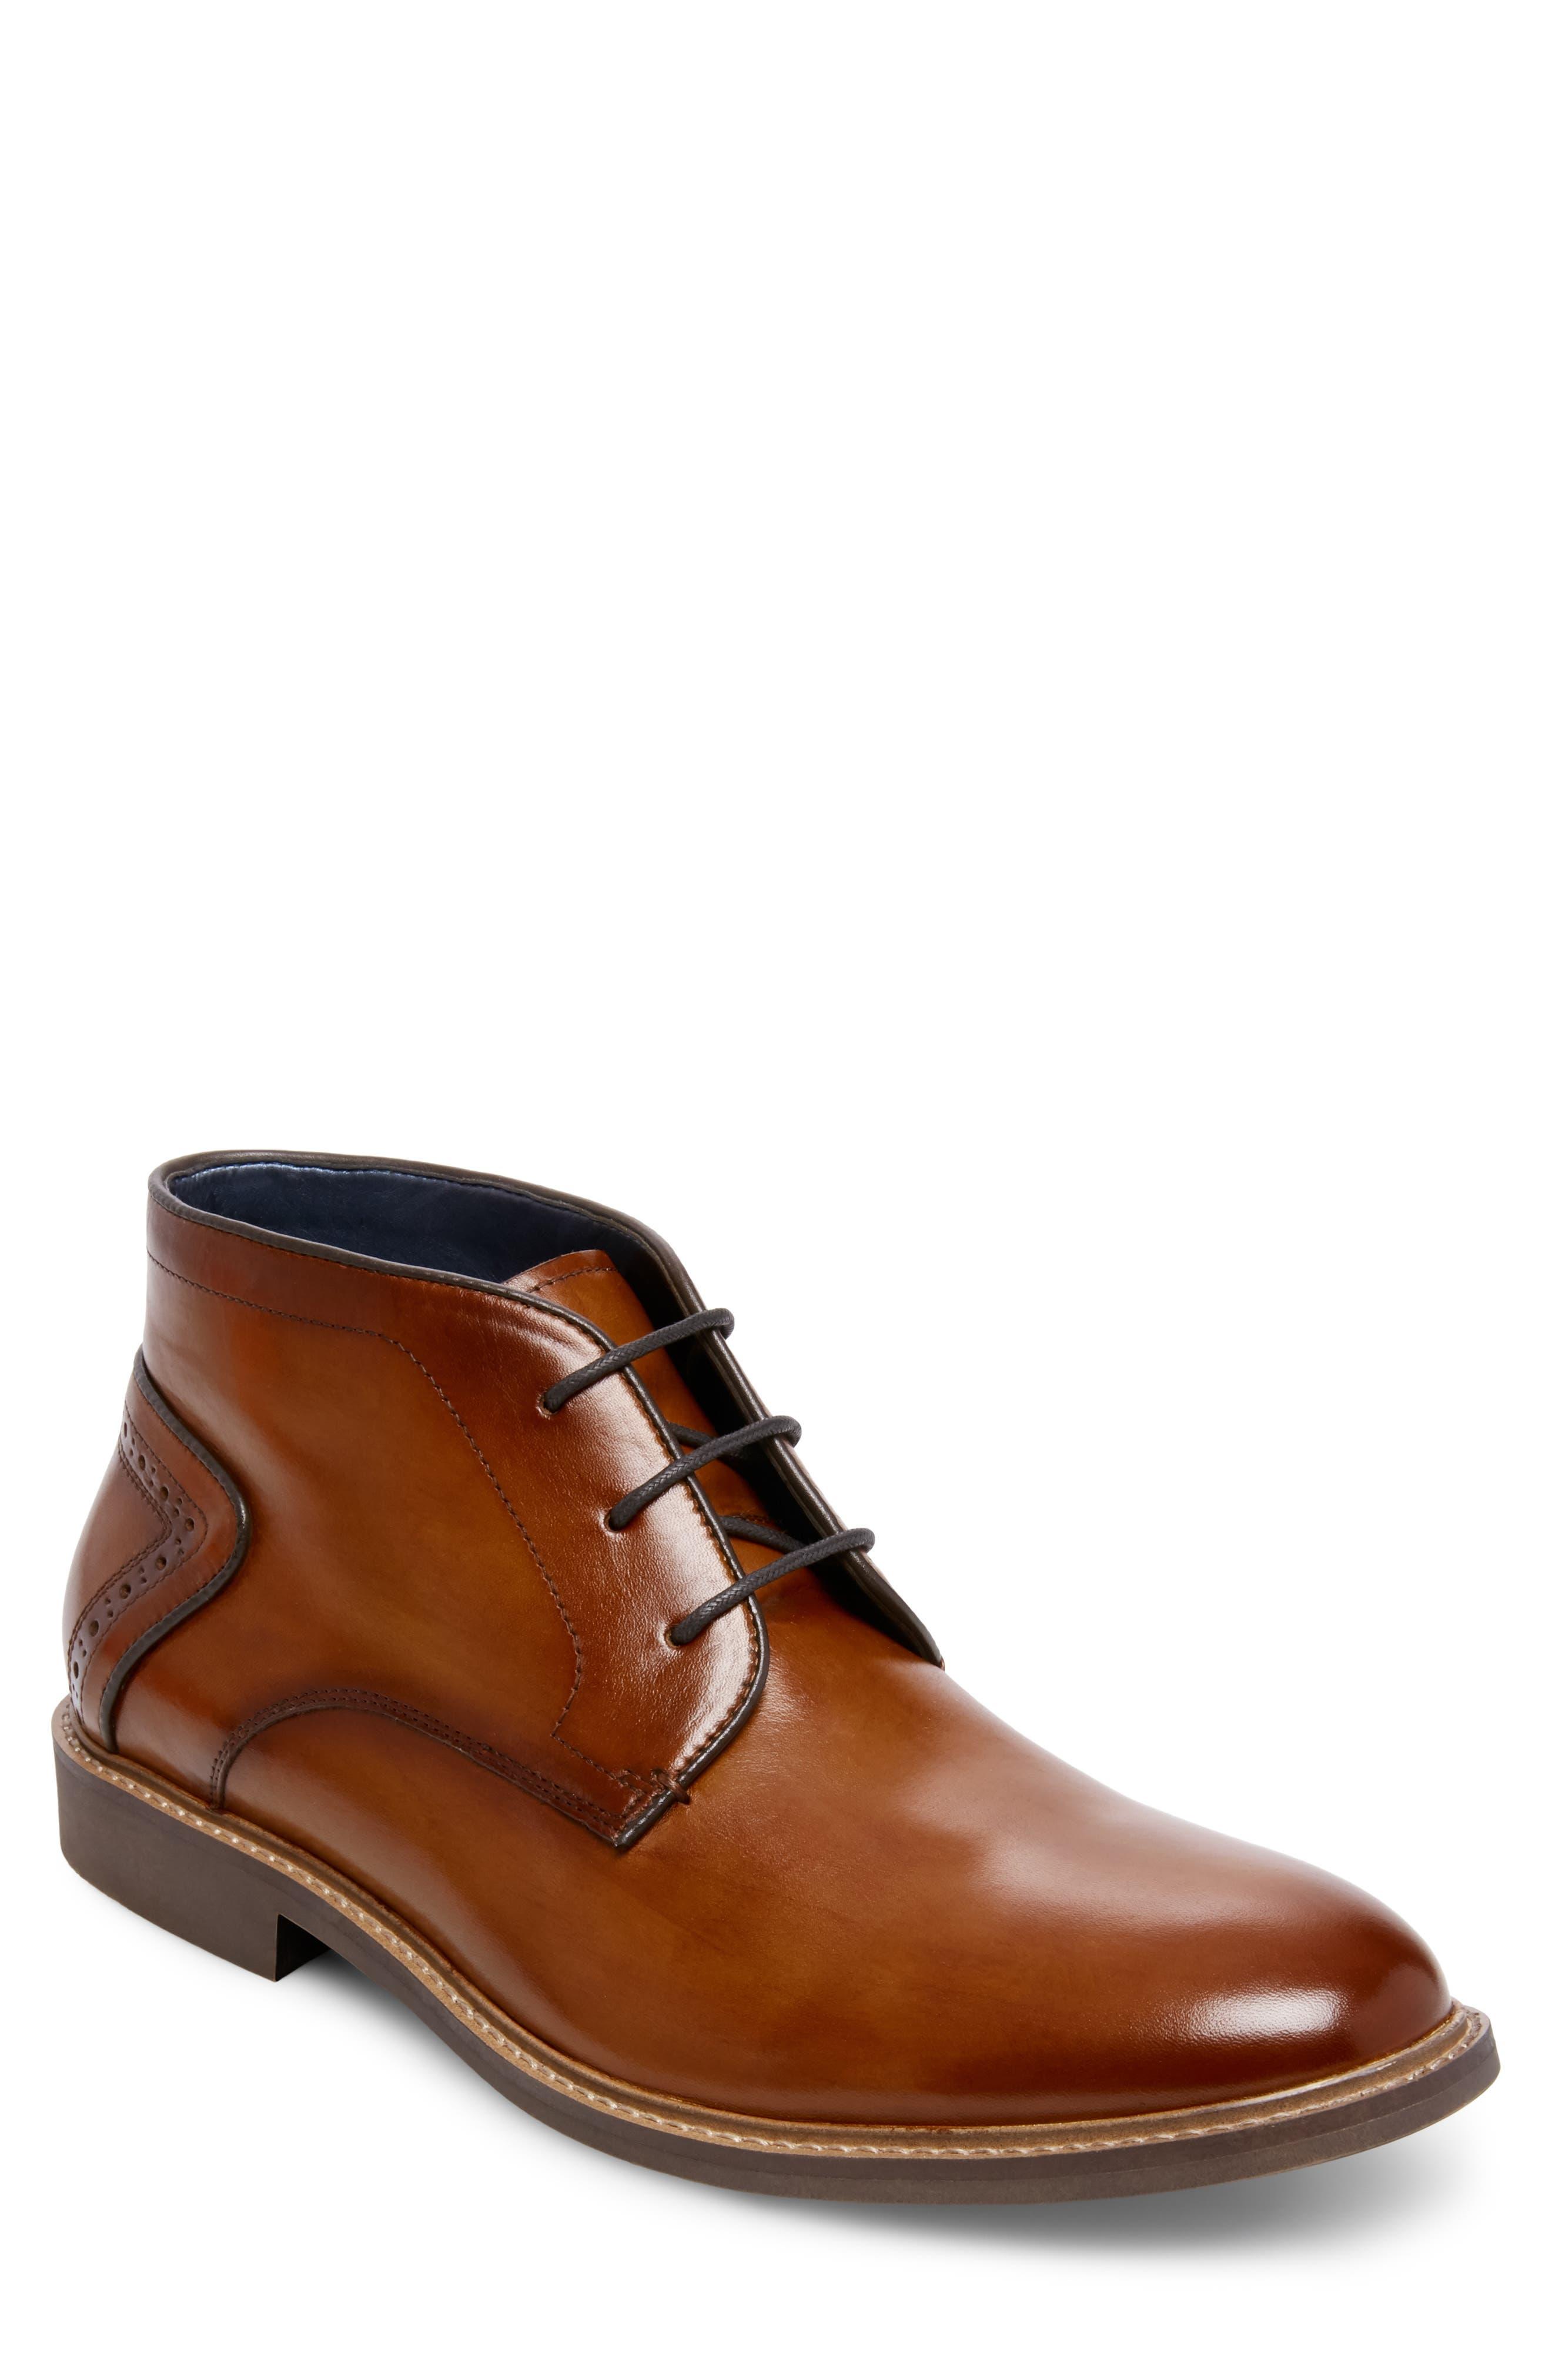 Backster Plain Toe Chukka Boot,                         Main,                         color, COGNAC LEATHER